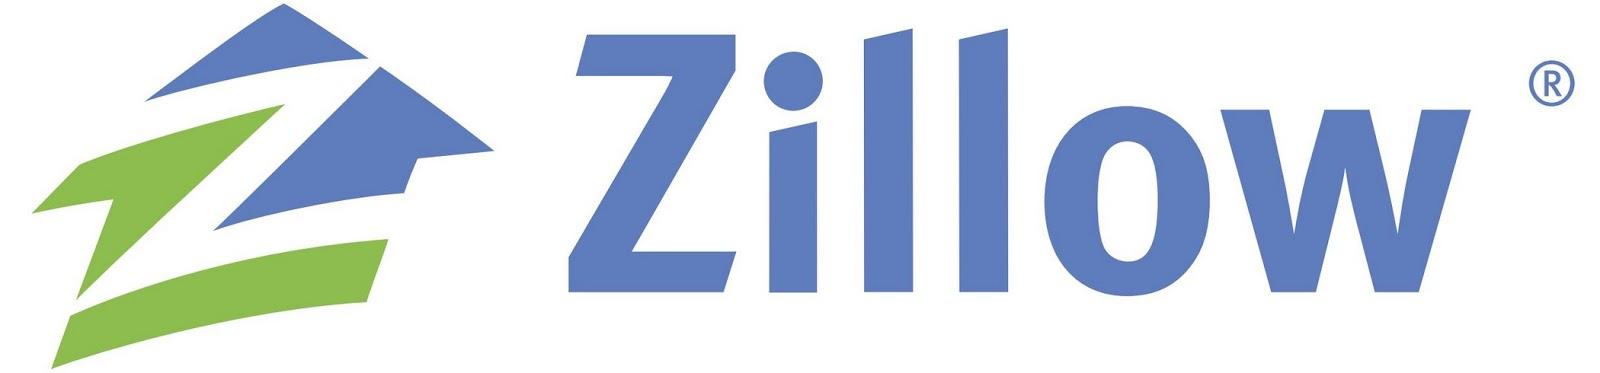 zillow testimonial